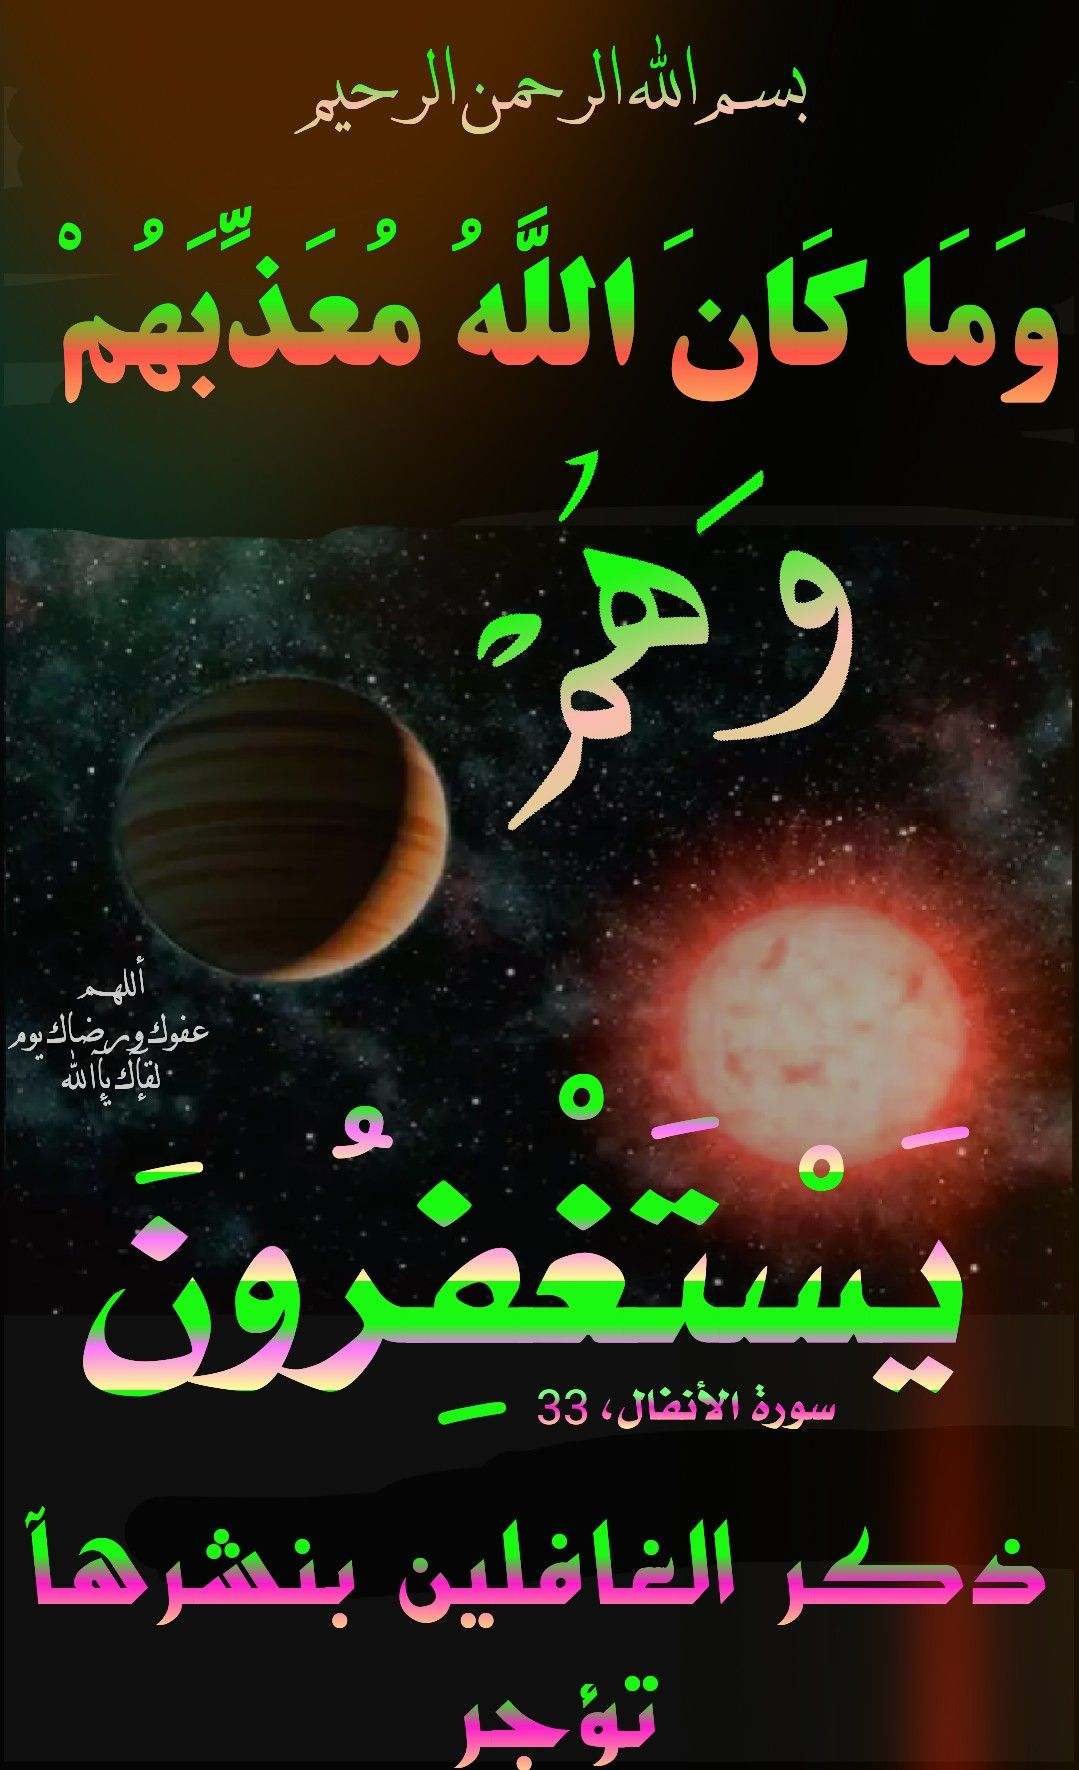 Ya Rab 3afwak Wa Ridhak ISLAM Pinterest